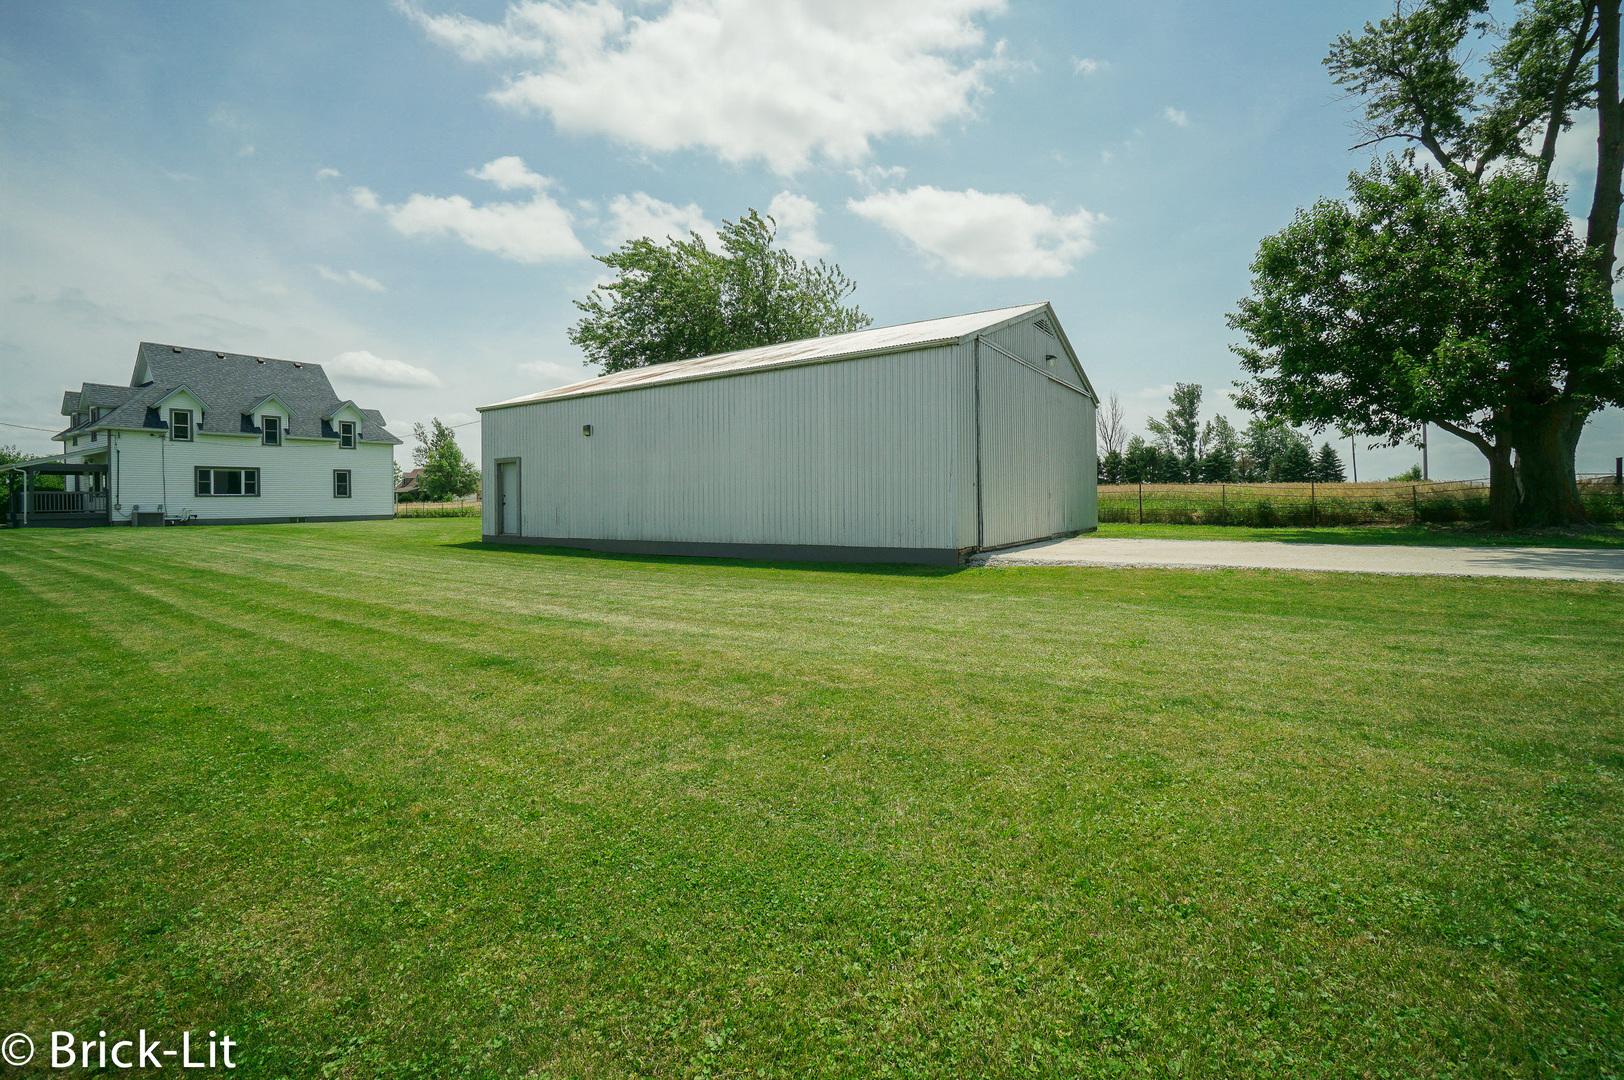 9543 West Barr, Peotone, Illinois, 60468